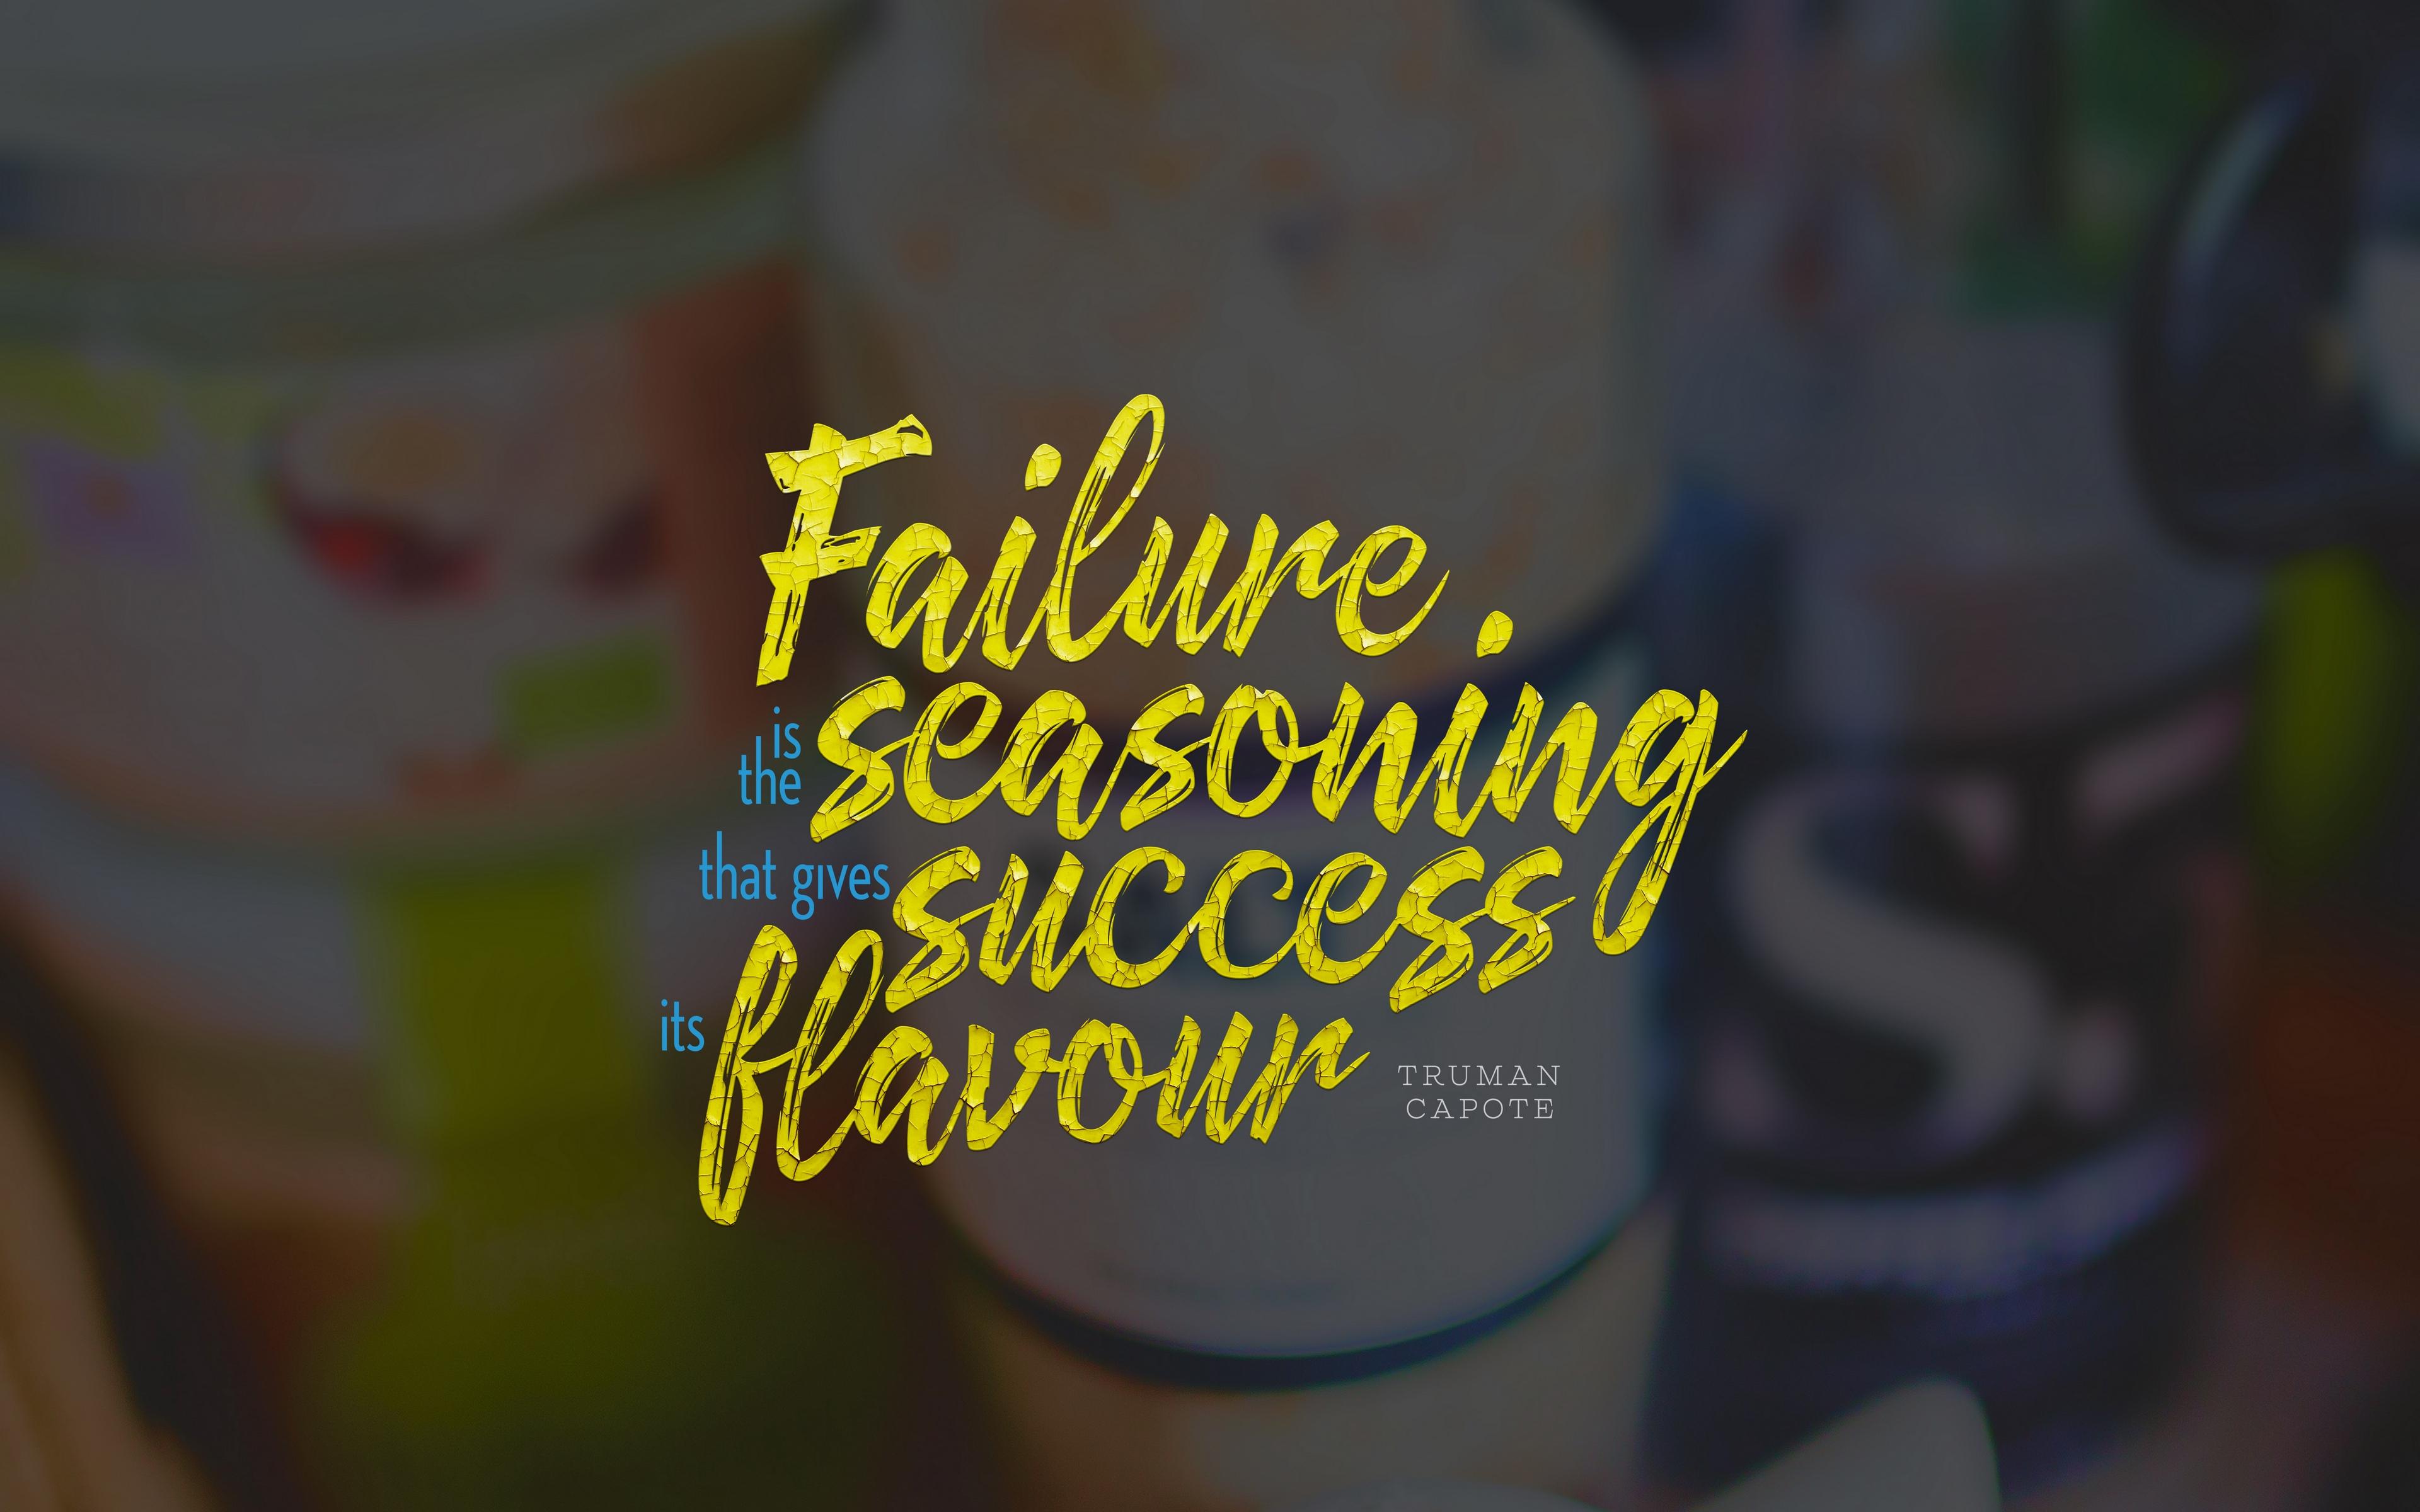 Wallpaper Quote, Motivation, Inspiration, Failure, - Inspirational Quotes Desktop Wallpaper Hd - HD Wallpaper